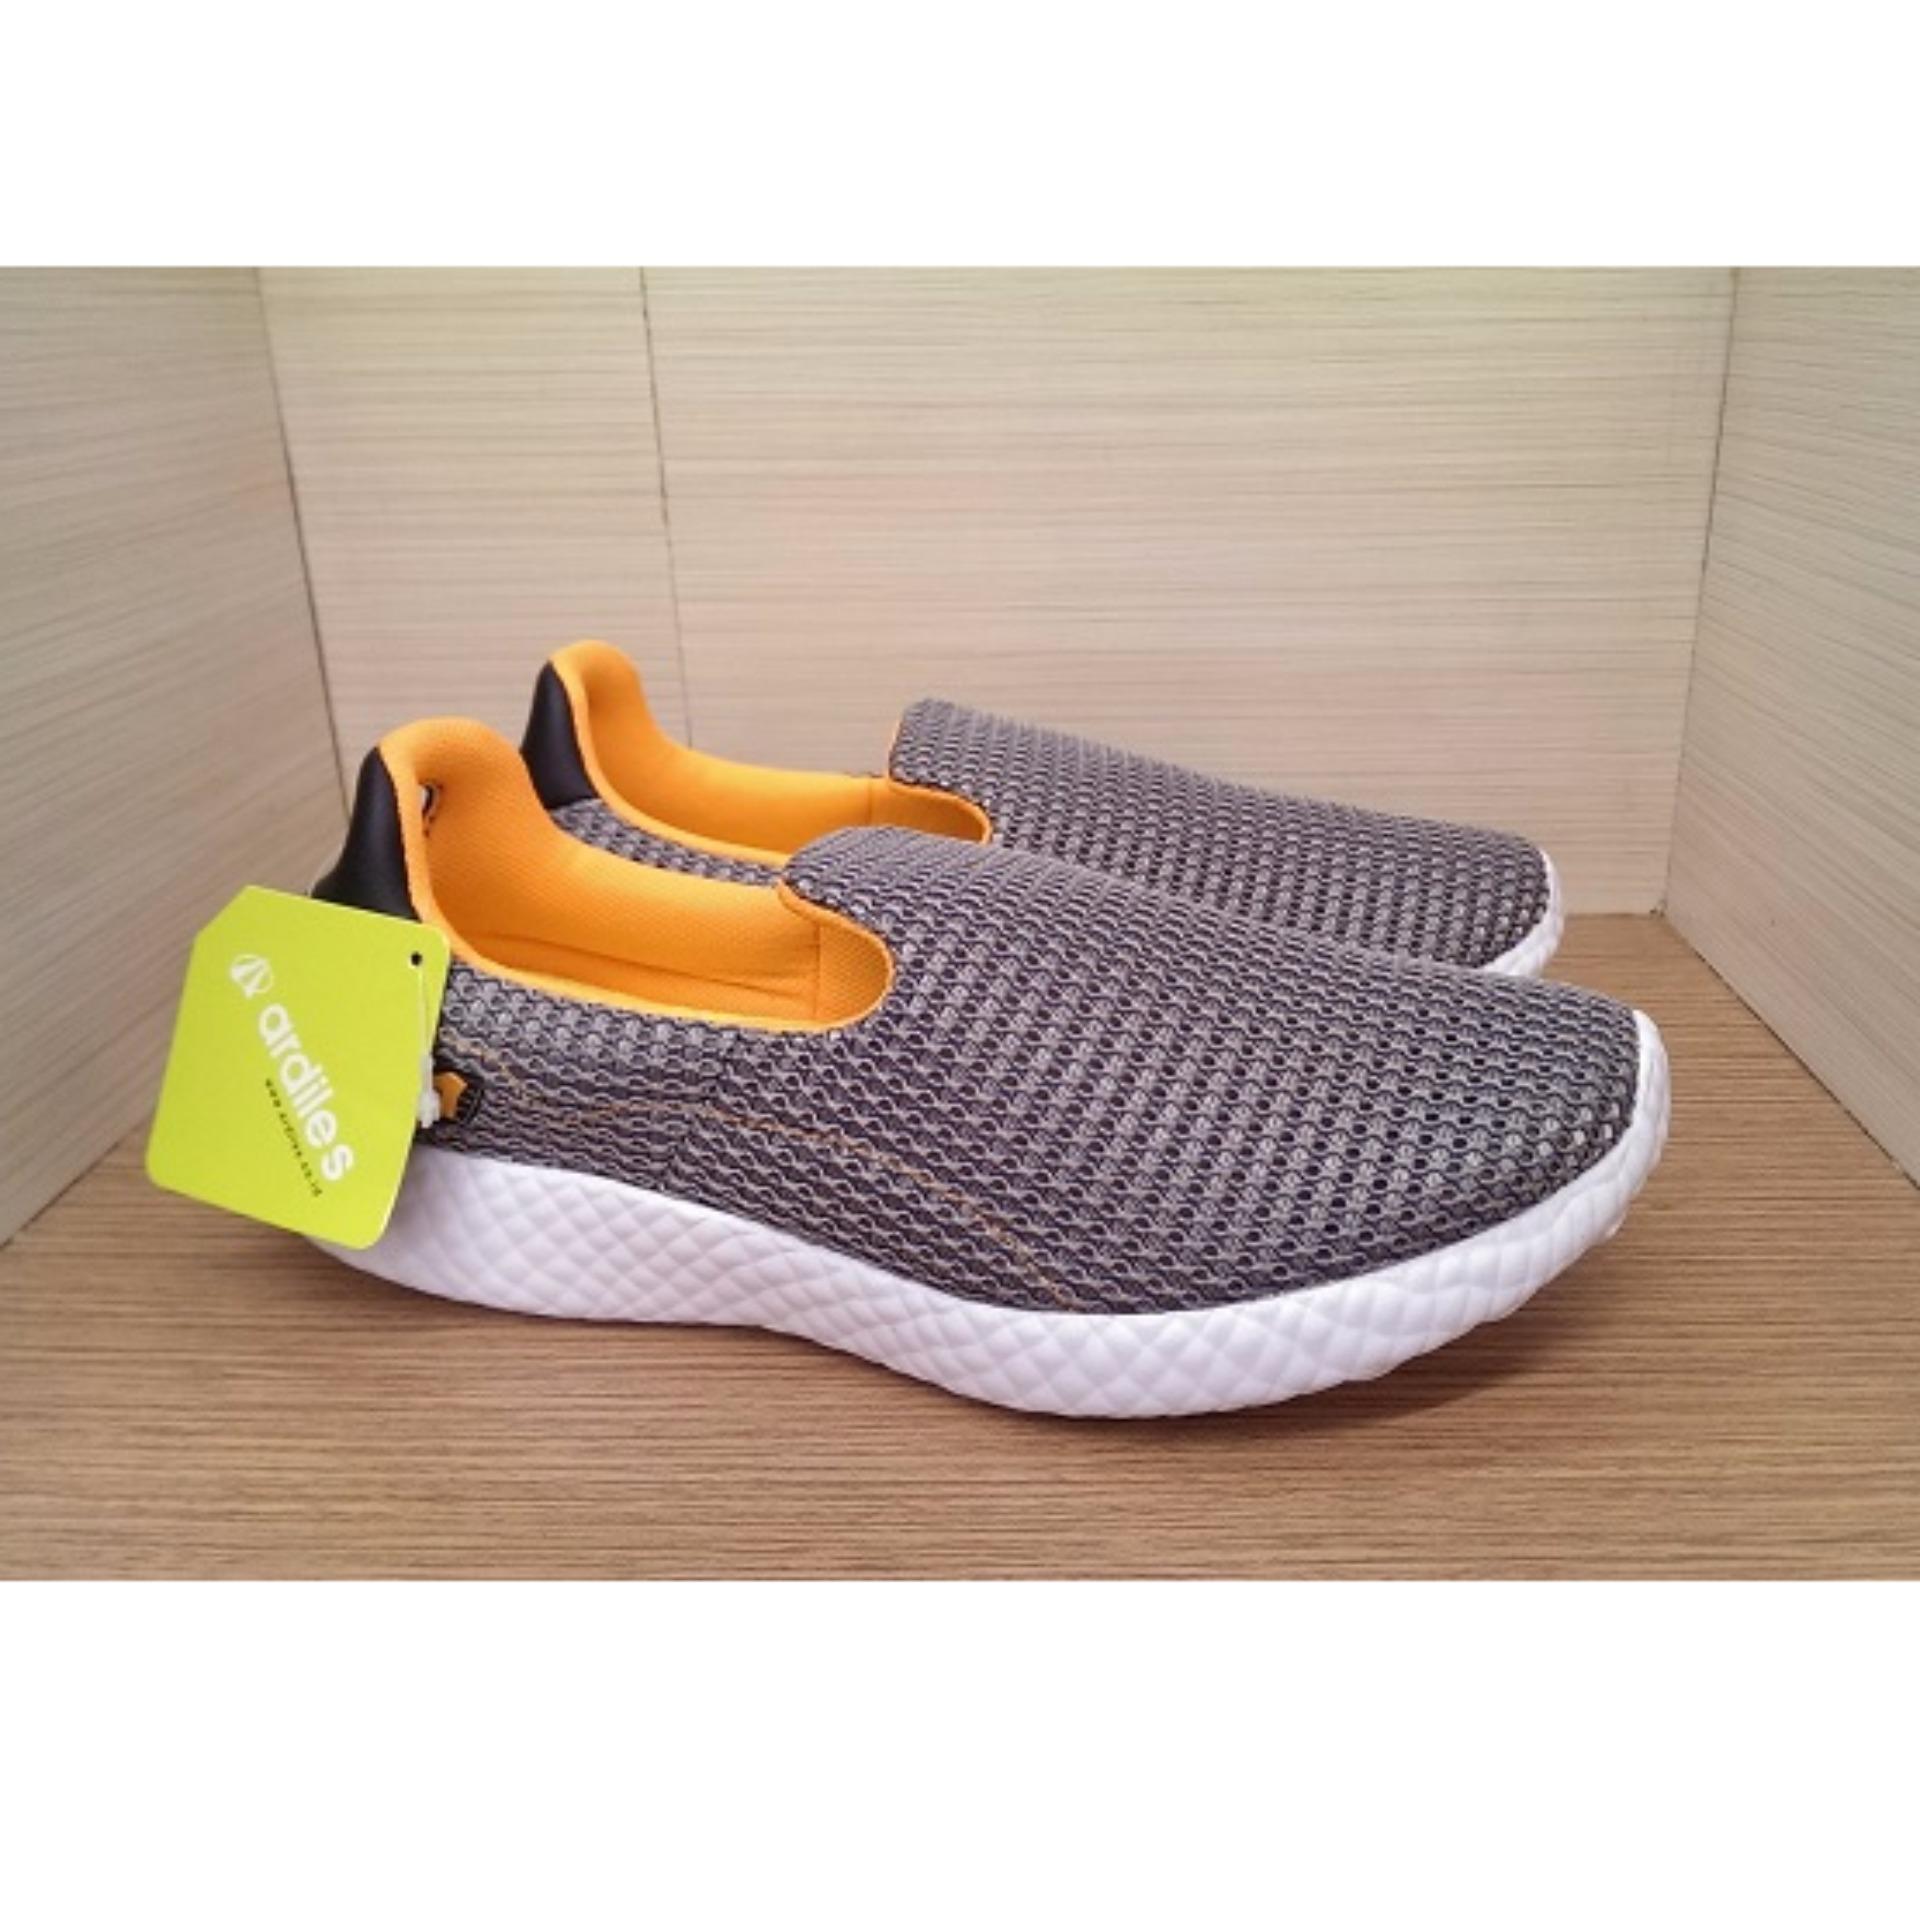 MURAH PROMO Dr. Kevin Sepatu Olahraga Pria Slip On 9307 Abu - Sepatu ... 1a69c7679c